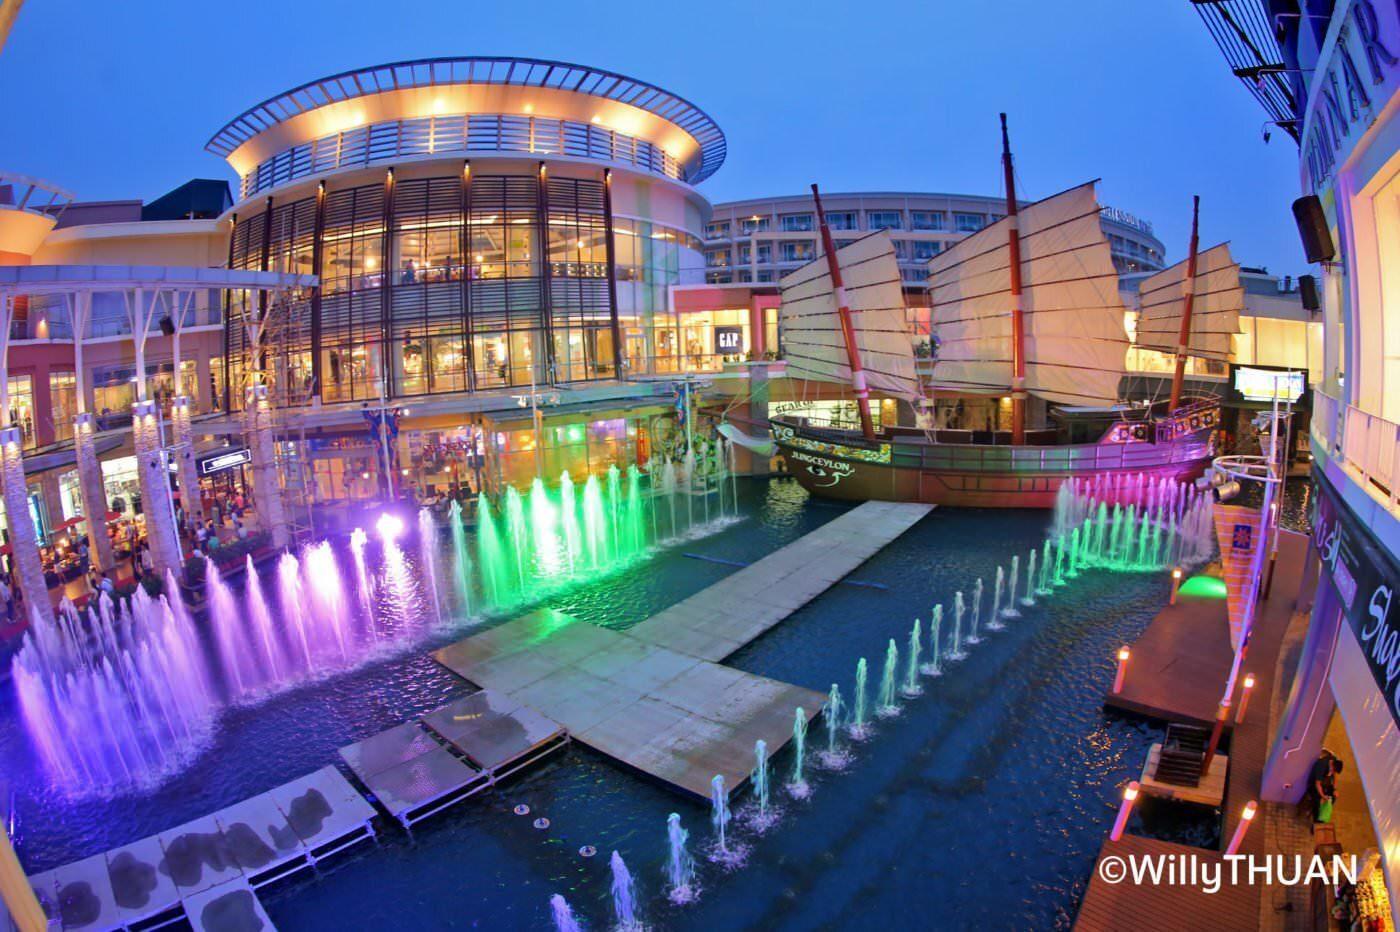 Phuket Shopping Malls